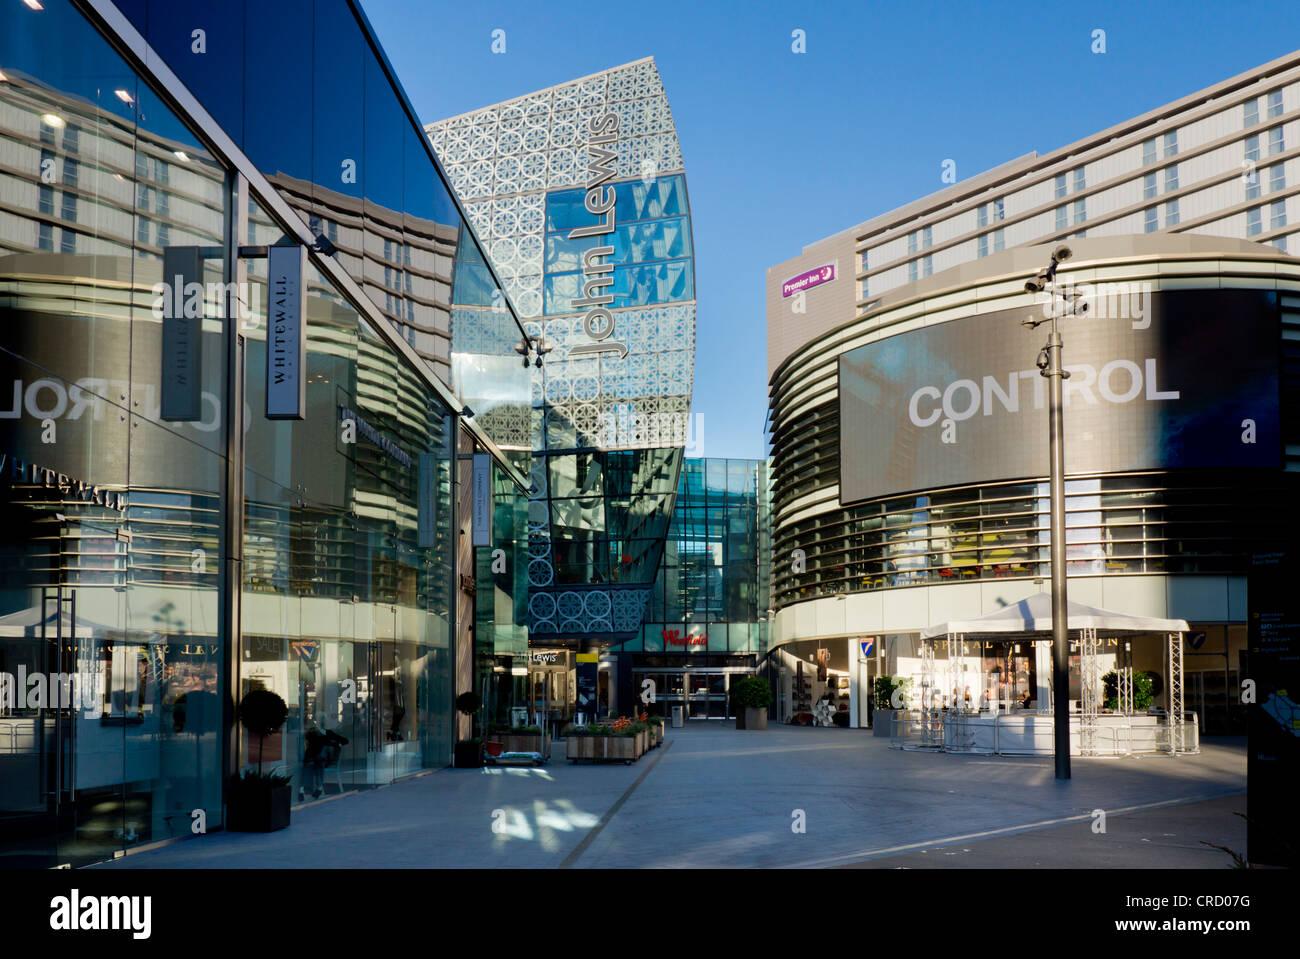 Westfield shopping center, Stratford, Borough of London, London, England, UK, Europe Stock Photo